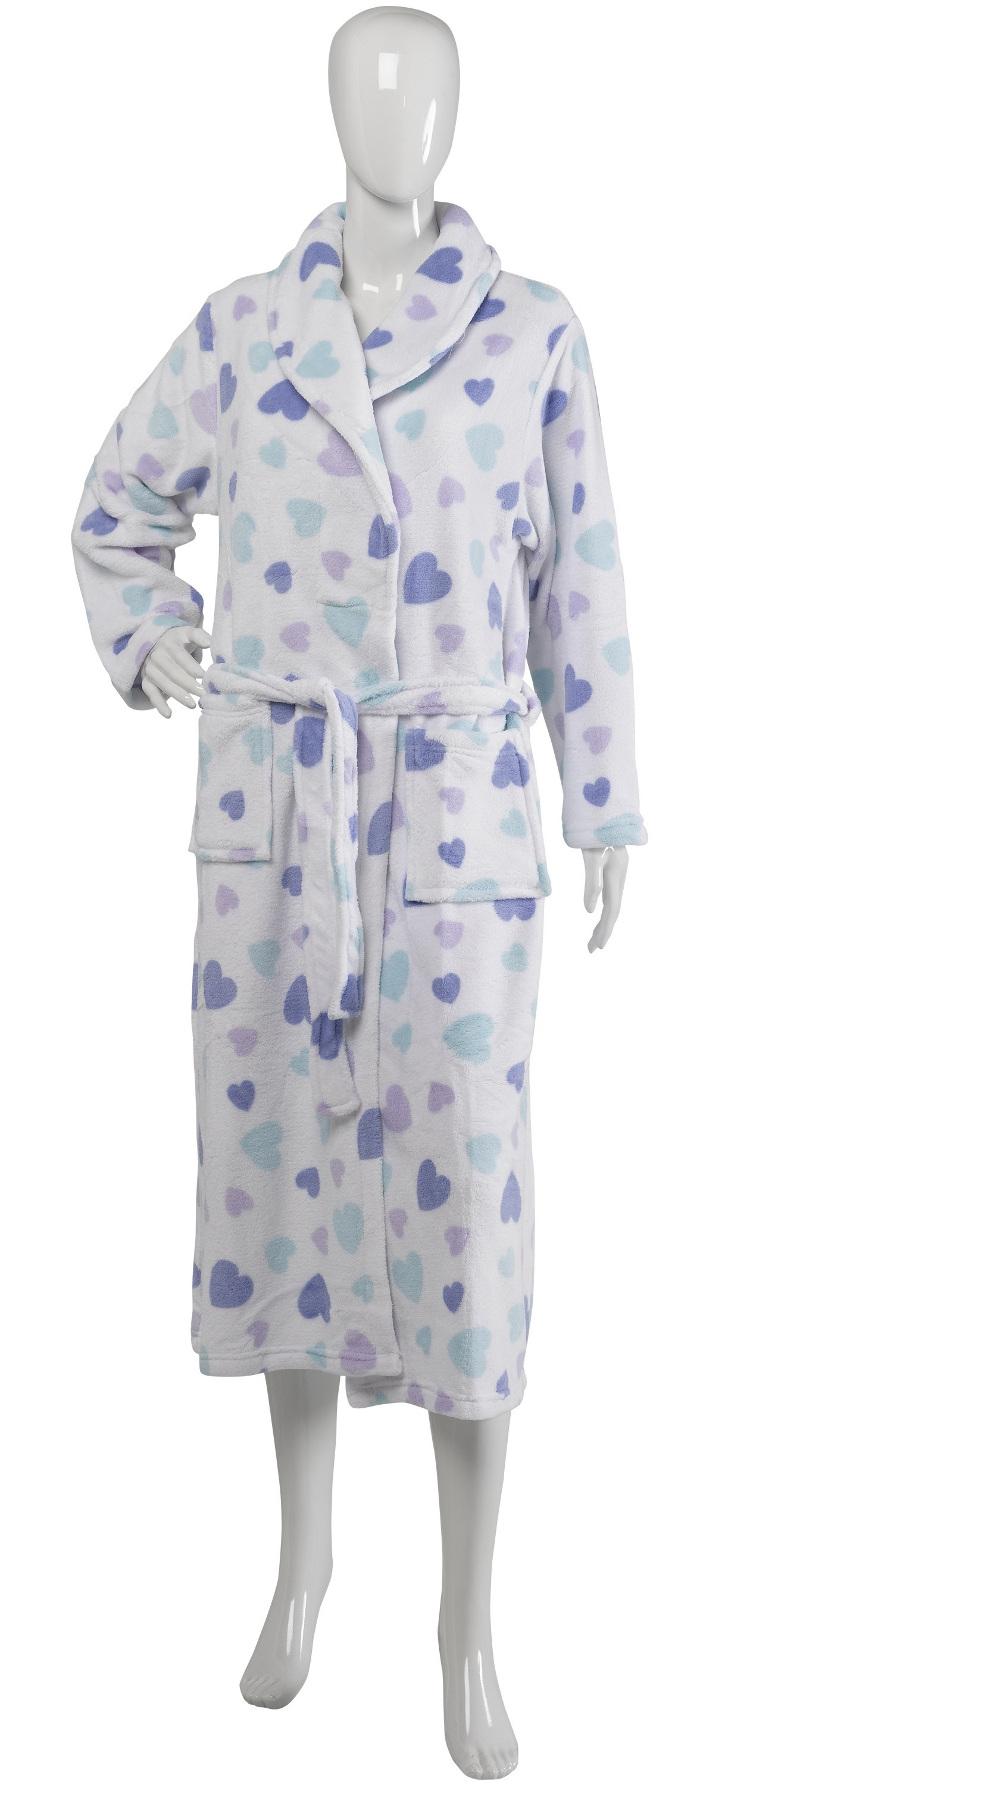 356faa3a09 Slenderella Womens Soft Fleece Heart Dressing Gown Ladies Shawl ...